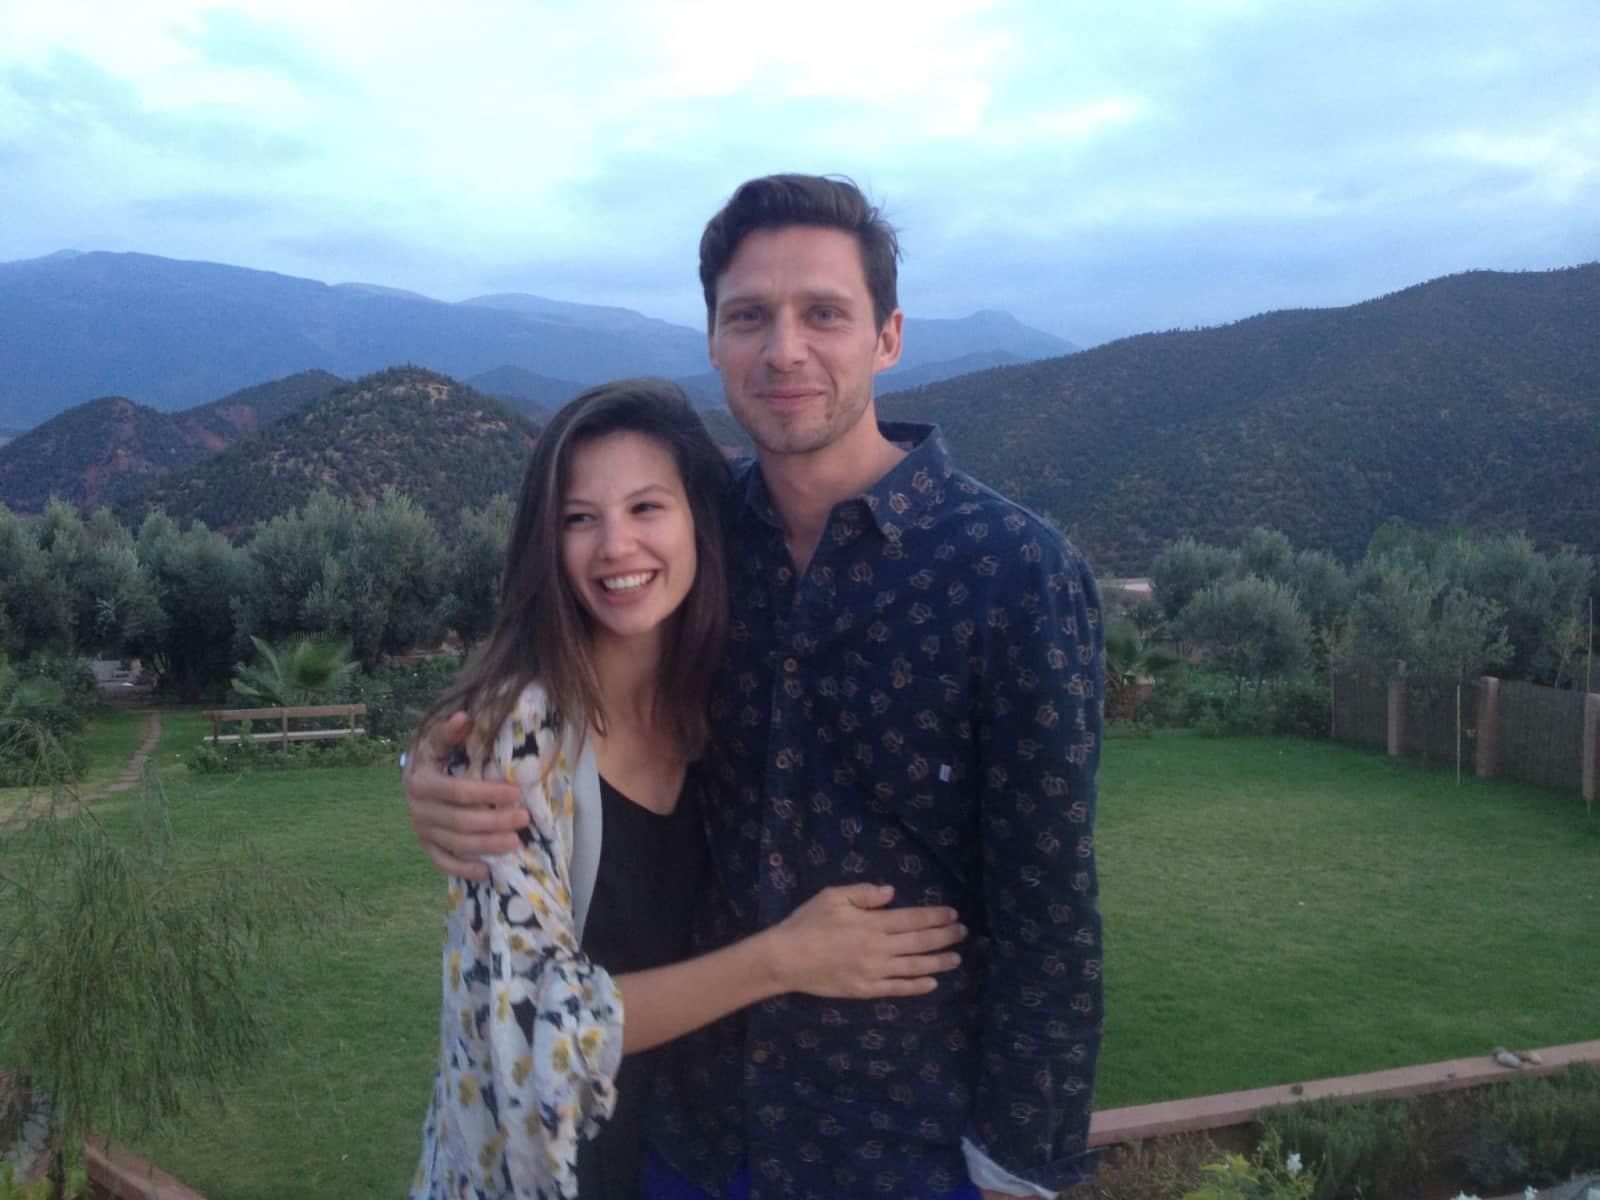 Juliet & Jon-paul from Los Angeles, California, United States